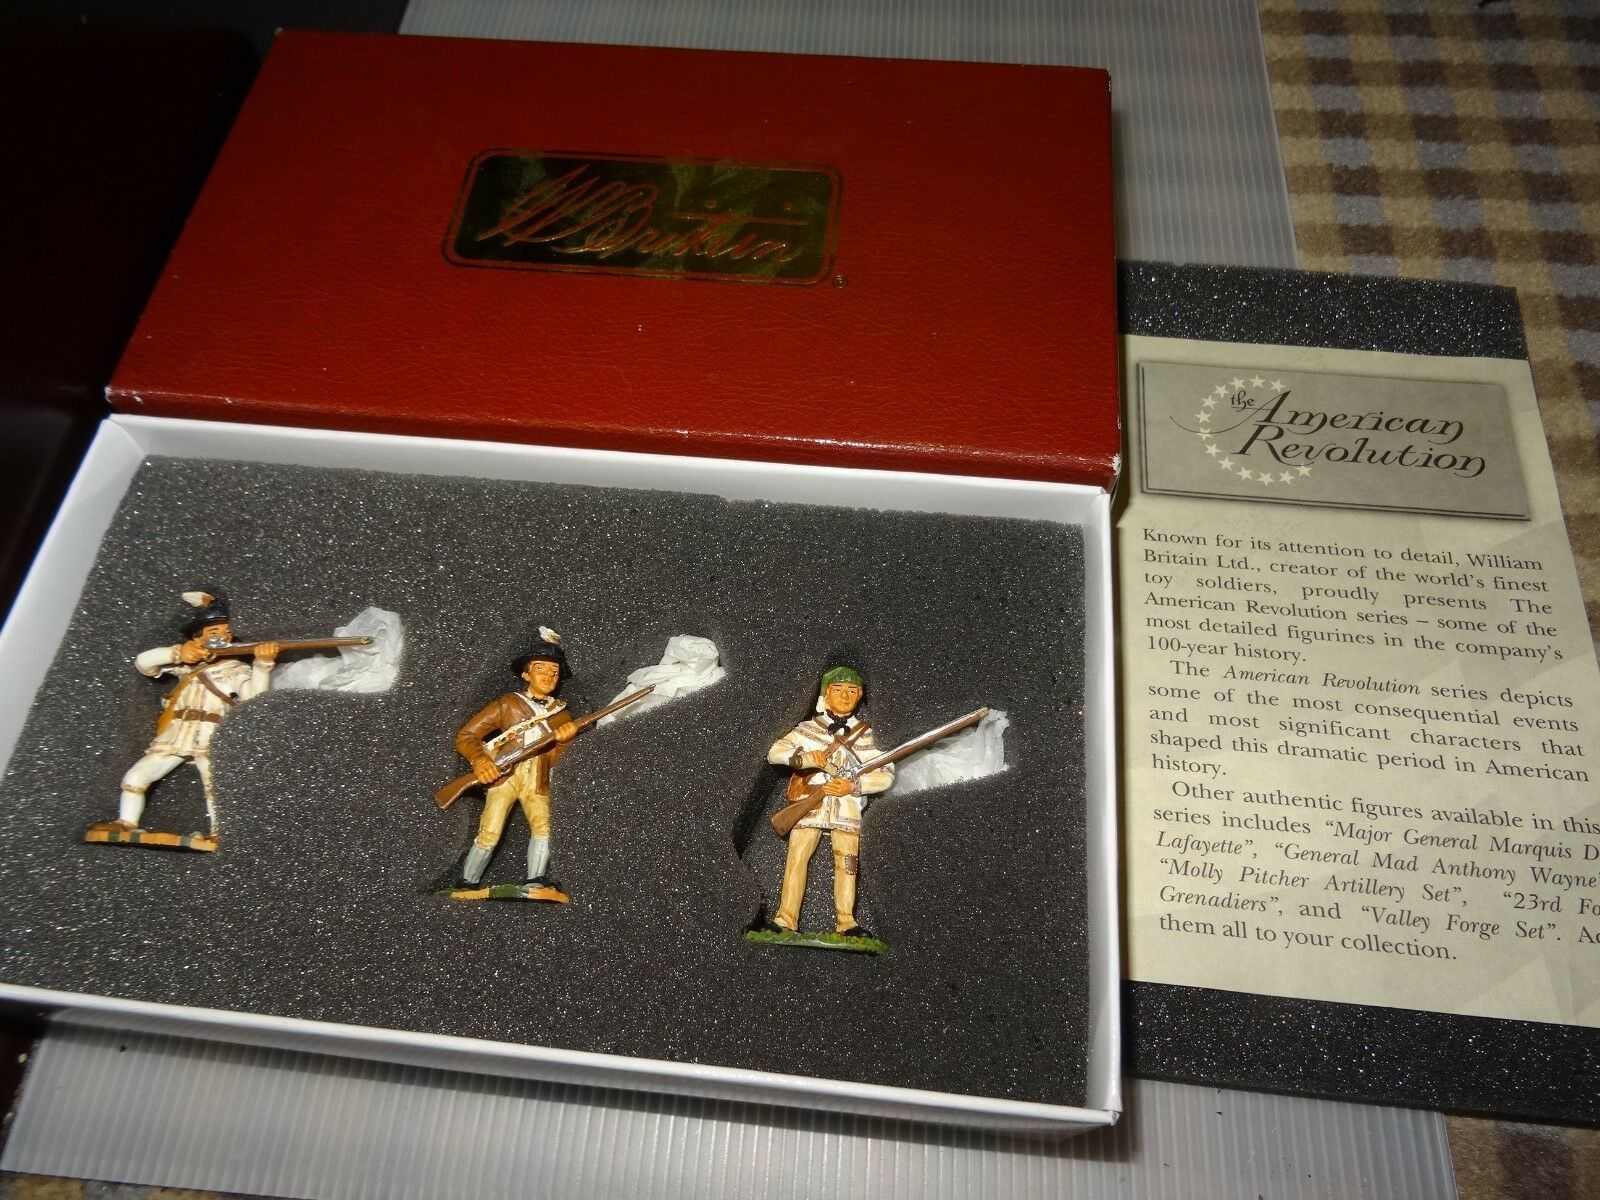 Britains-American Revolution Series-Set 17449 - MORGANS RIFLEMEN